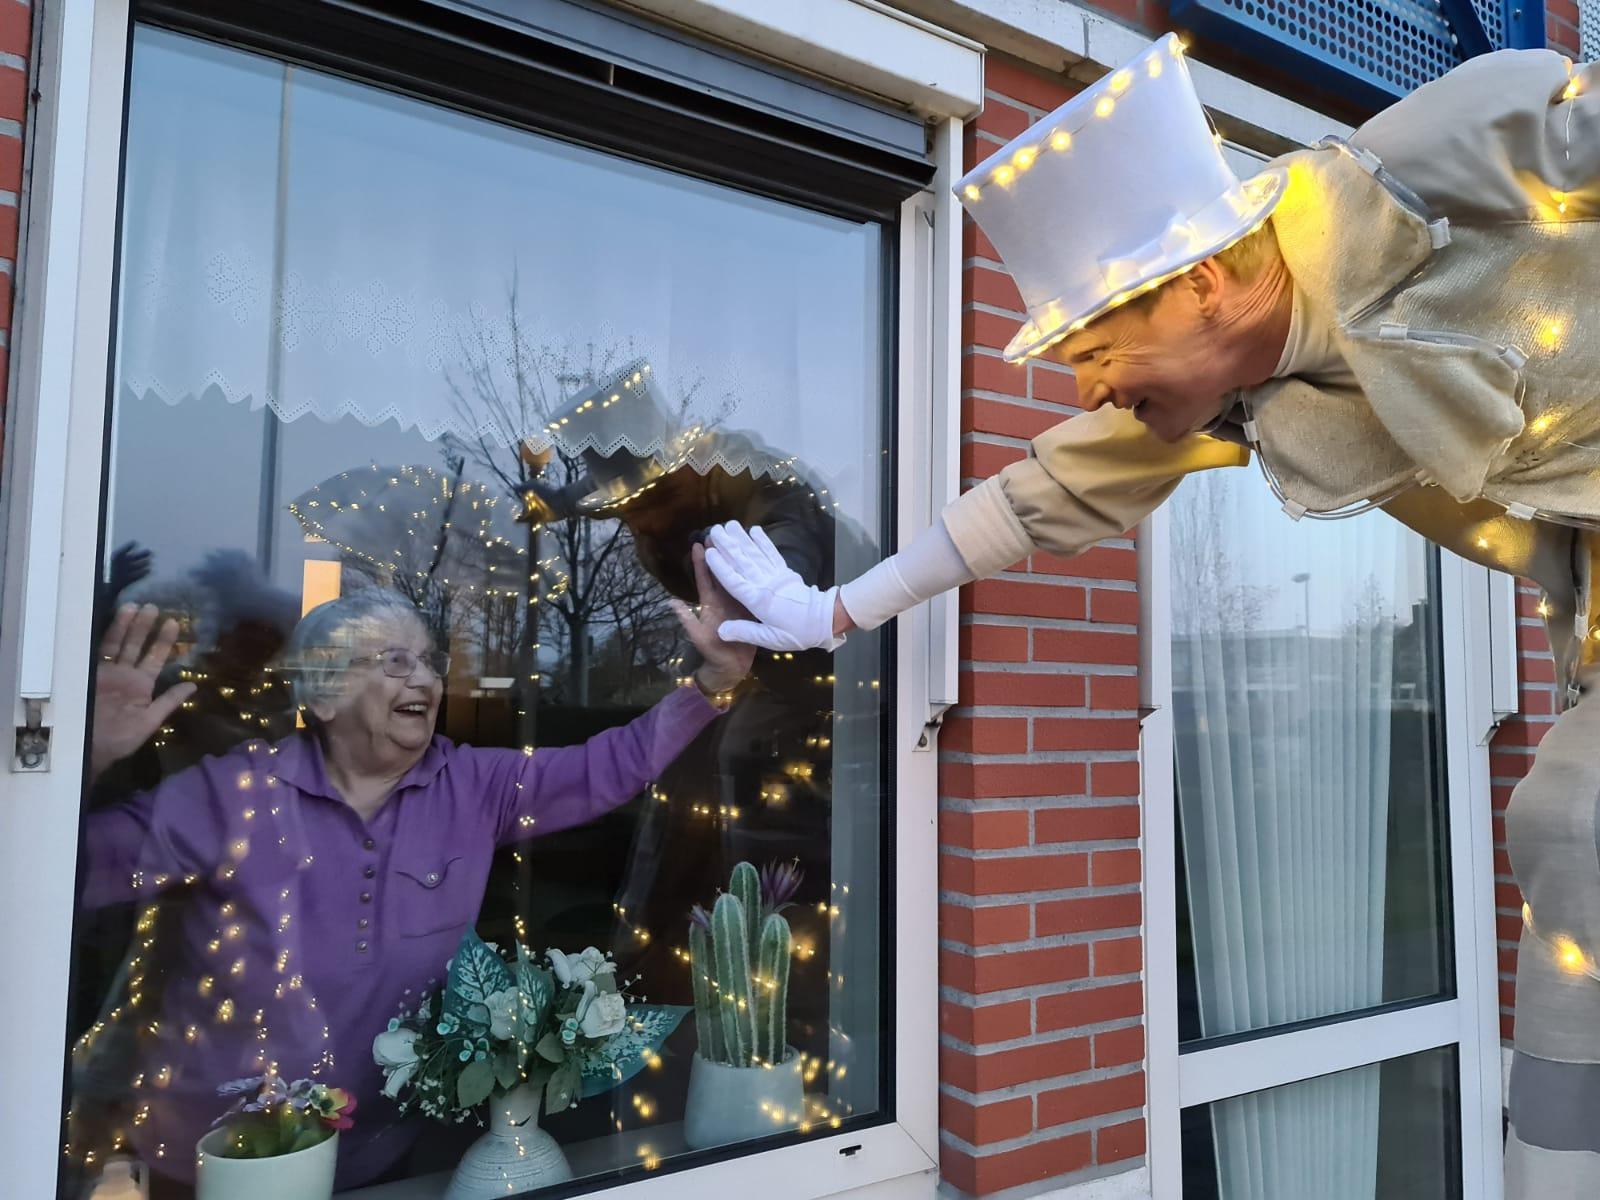 Lichtgevers contact via raam